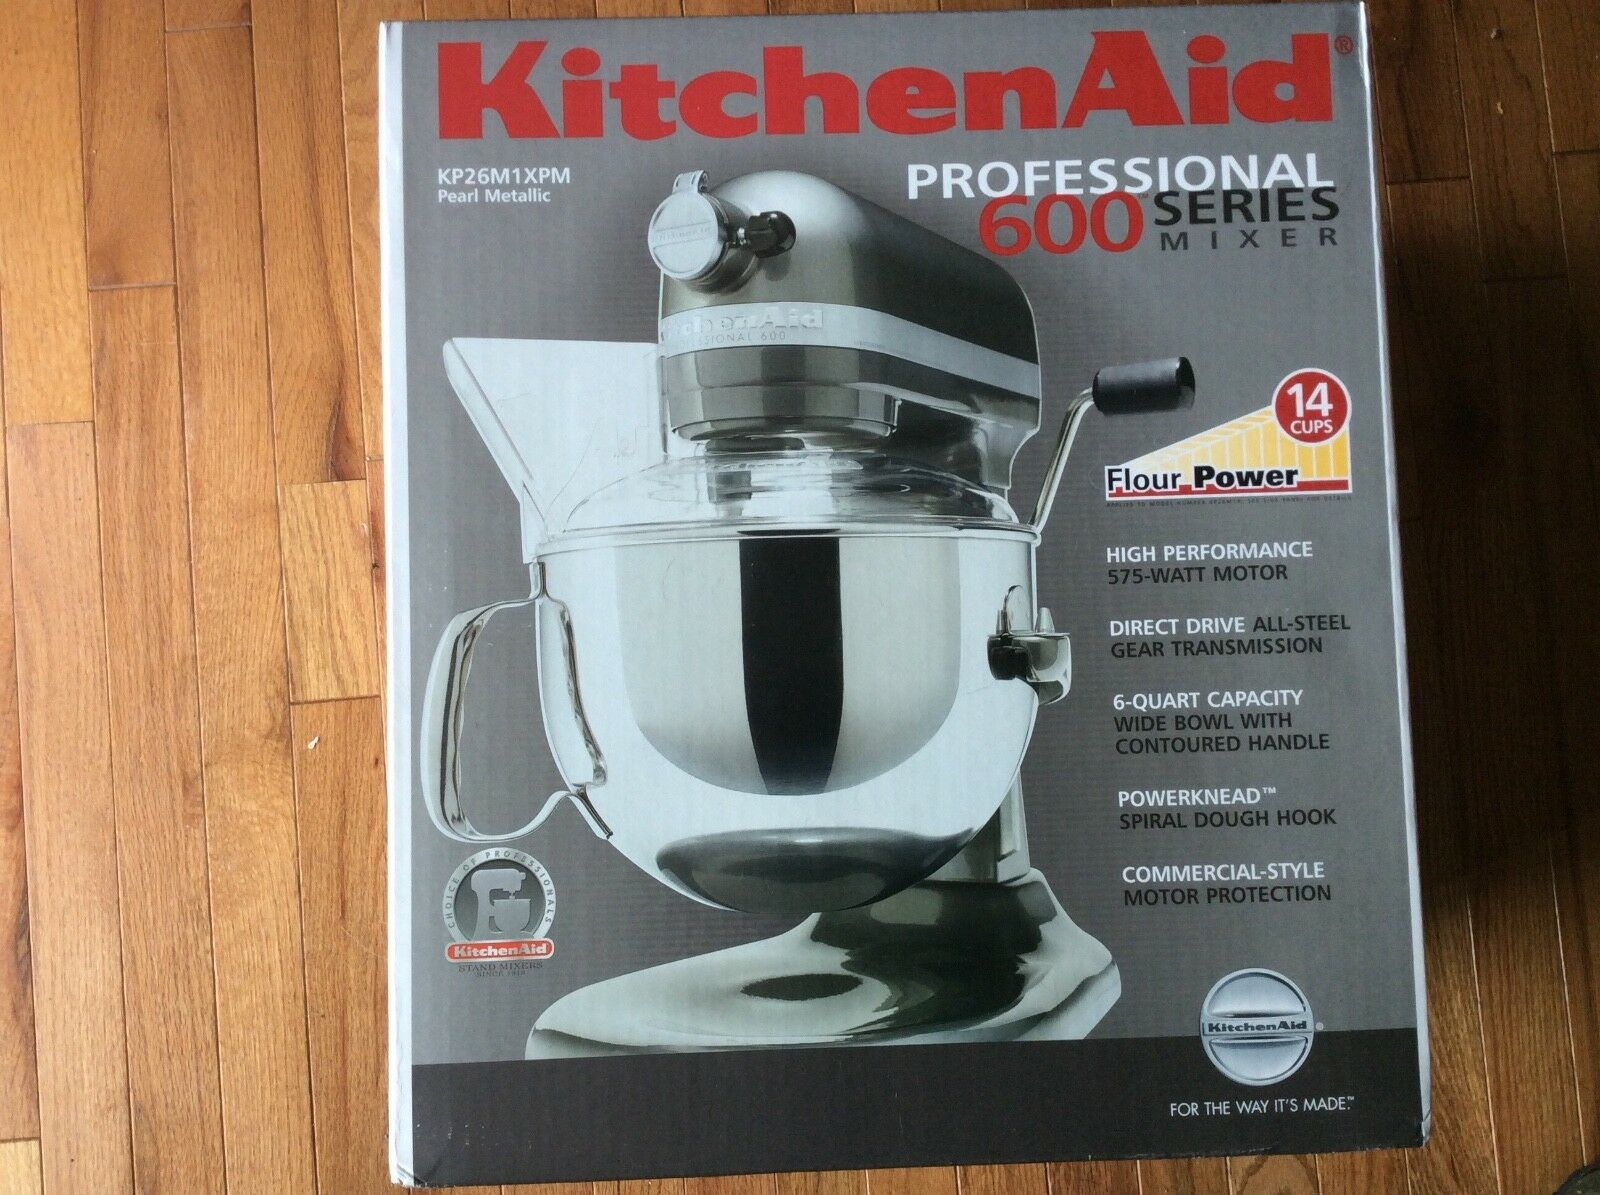 KitchenAid KP26M1XPM Professional 600 Series 6-Quart Stand M